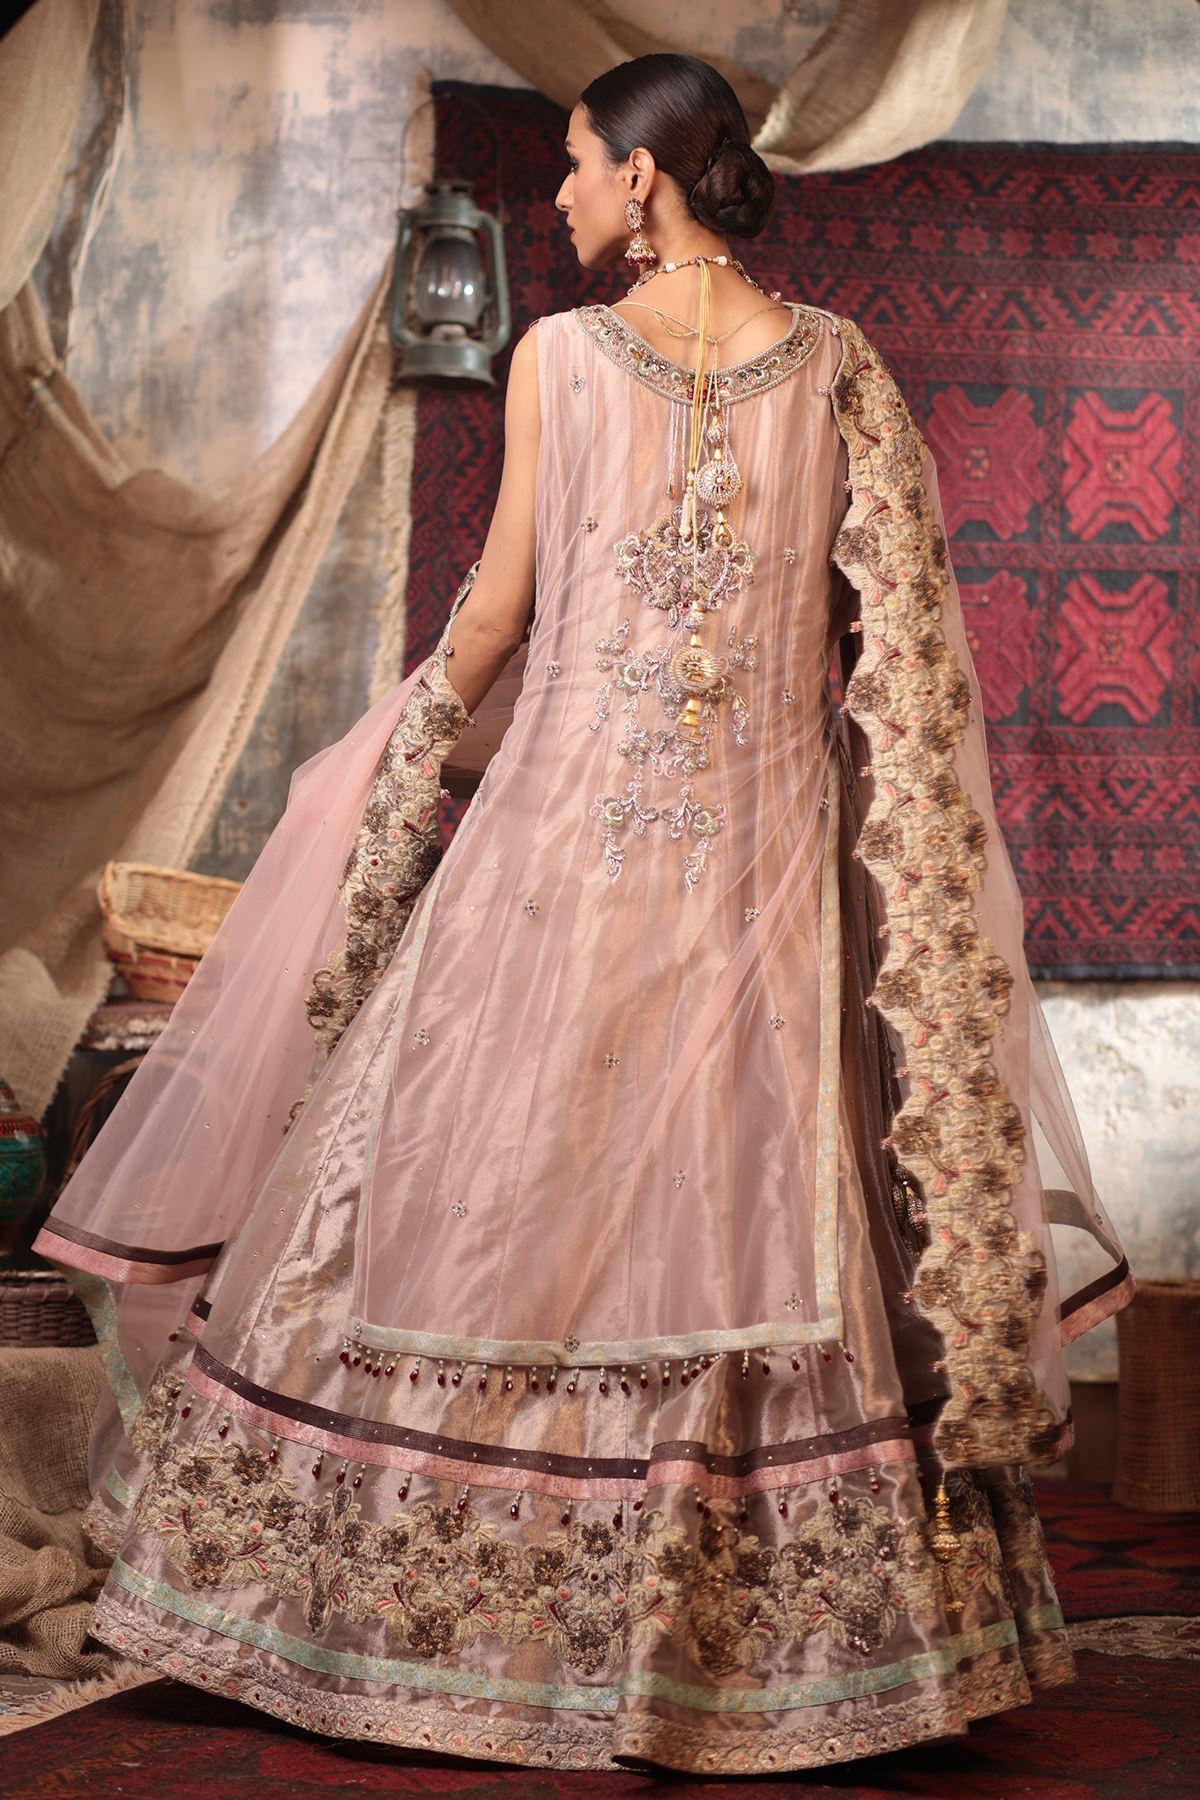 Moazzam Khan Party Wear 2PC Maxi Dupatta in Peach for Women